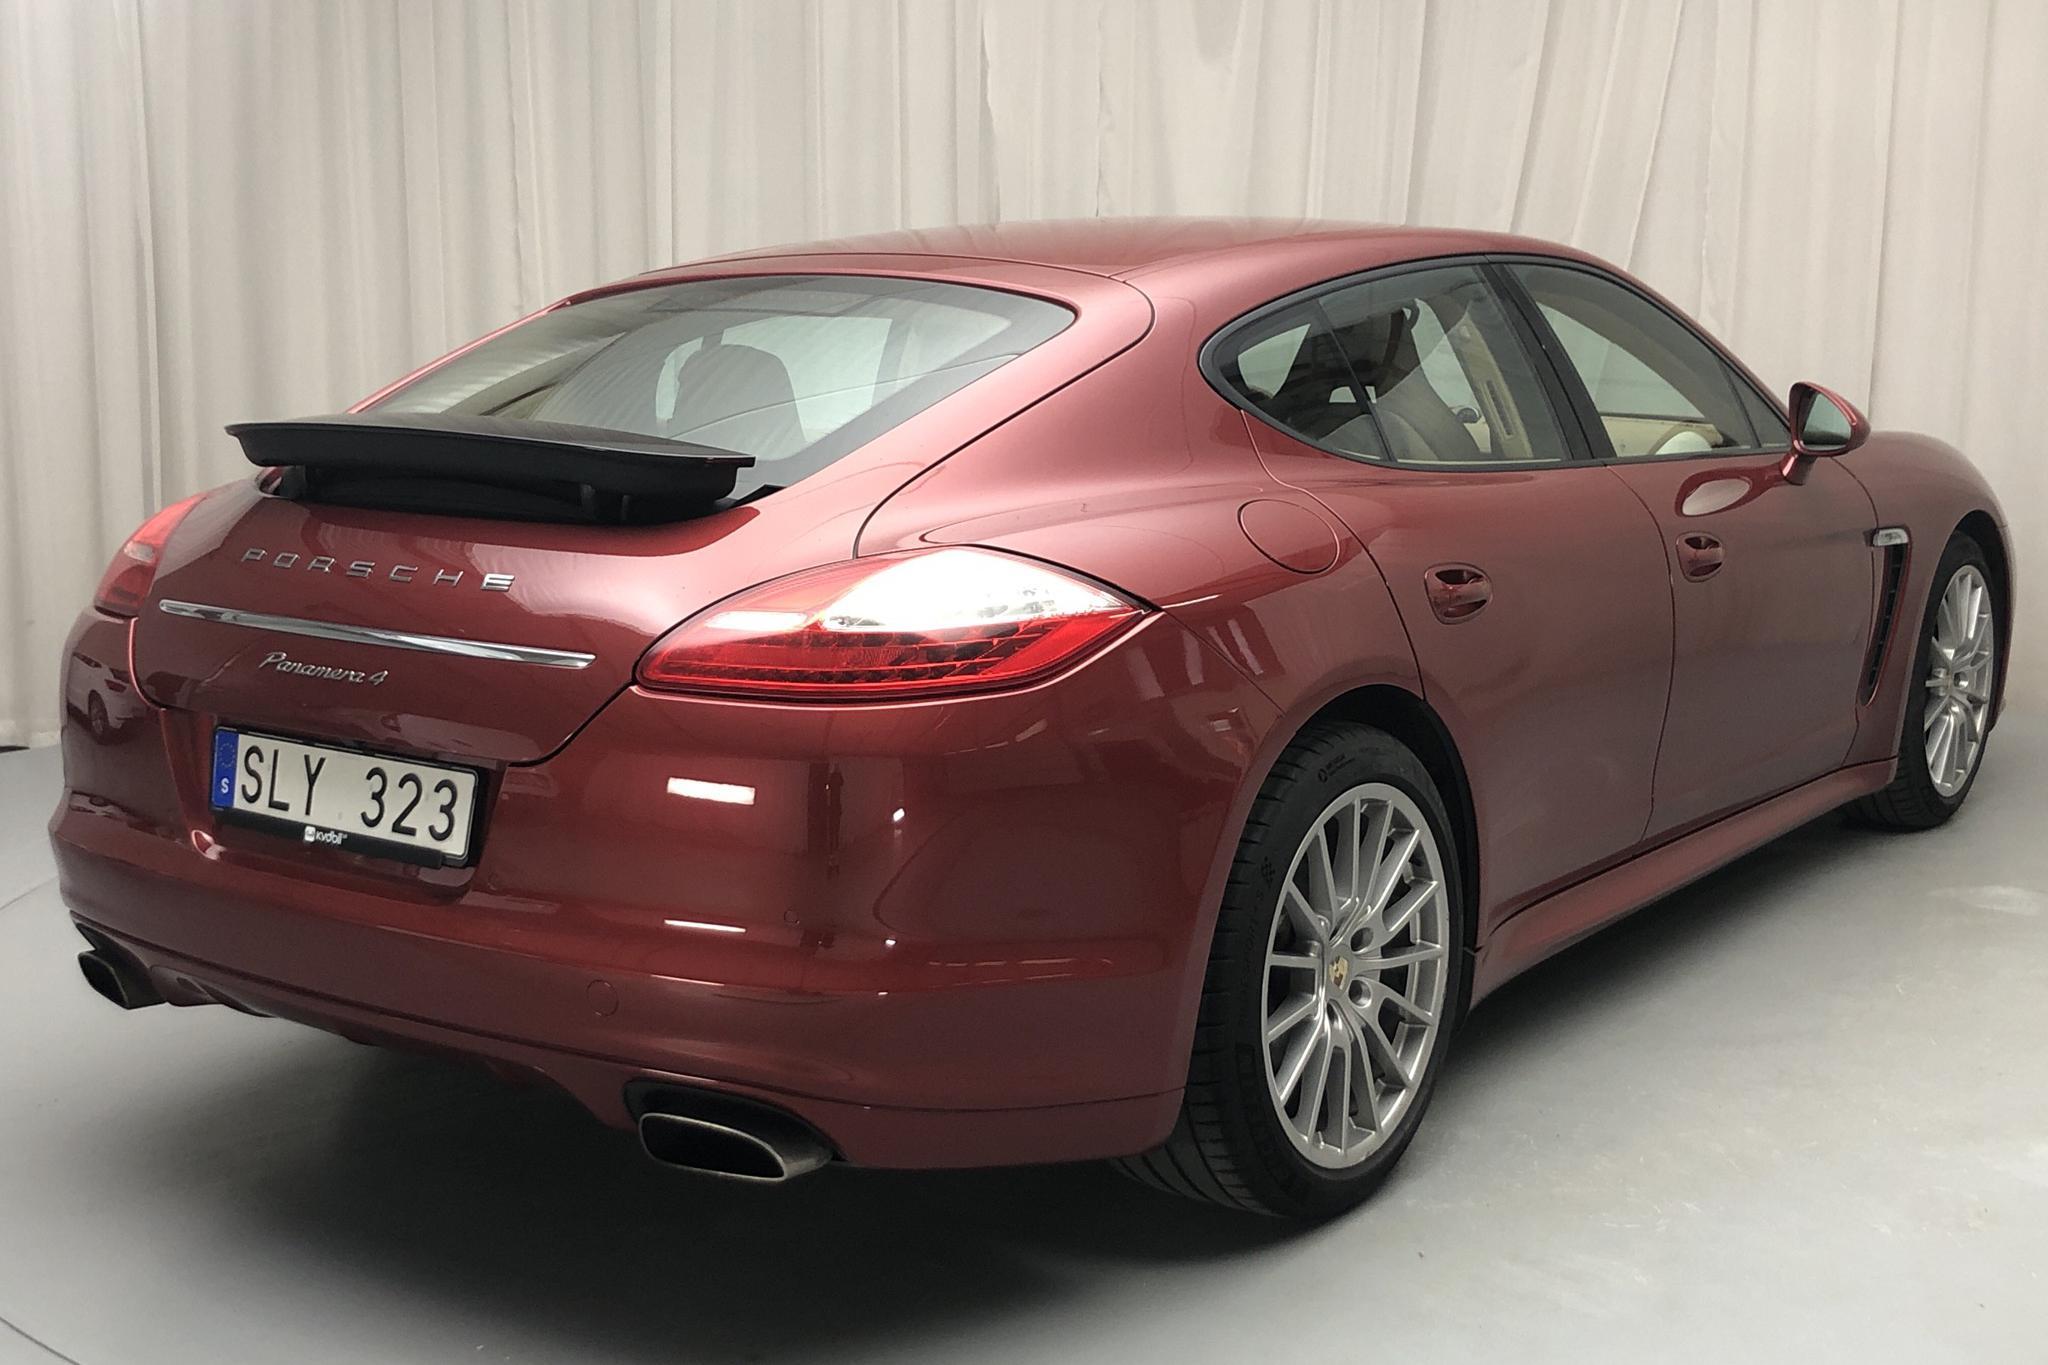 Porsche Panamera 4 (300hk) - 19 759 mil - Automat - Dark Red - 2012